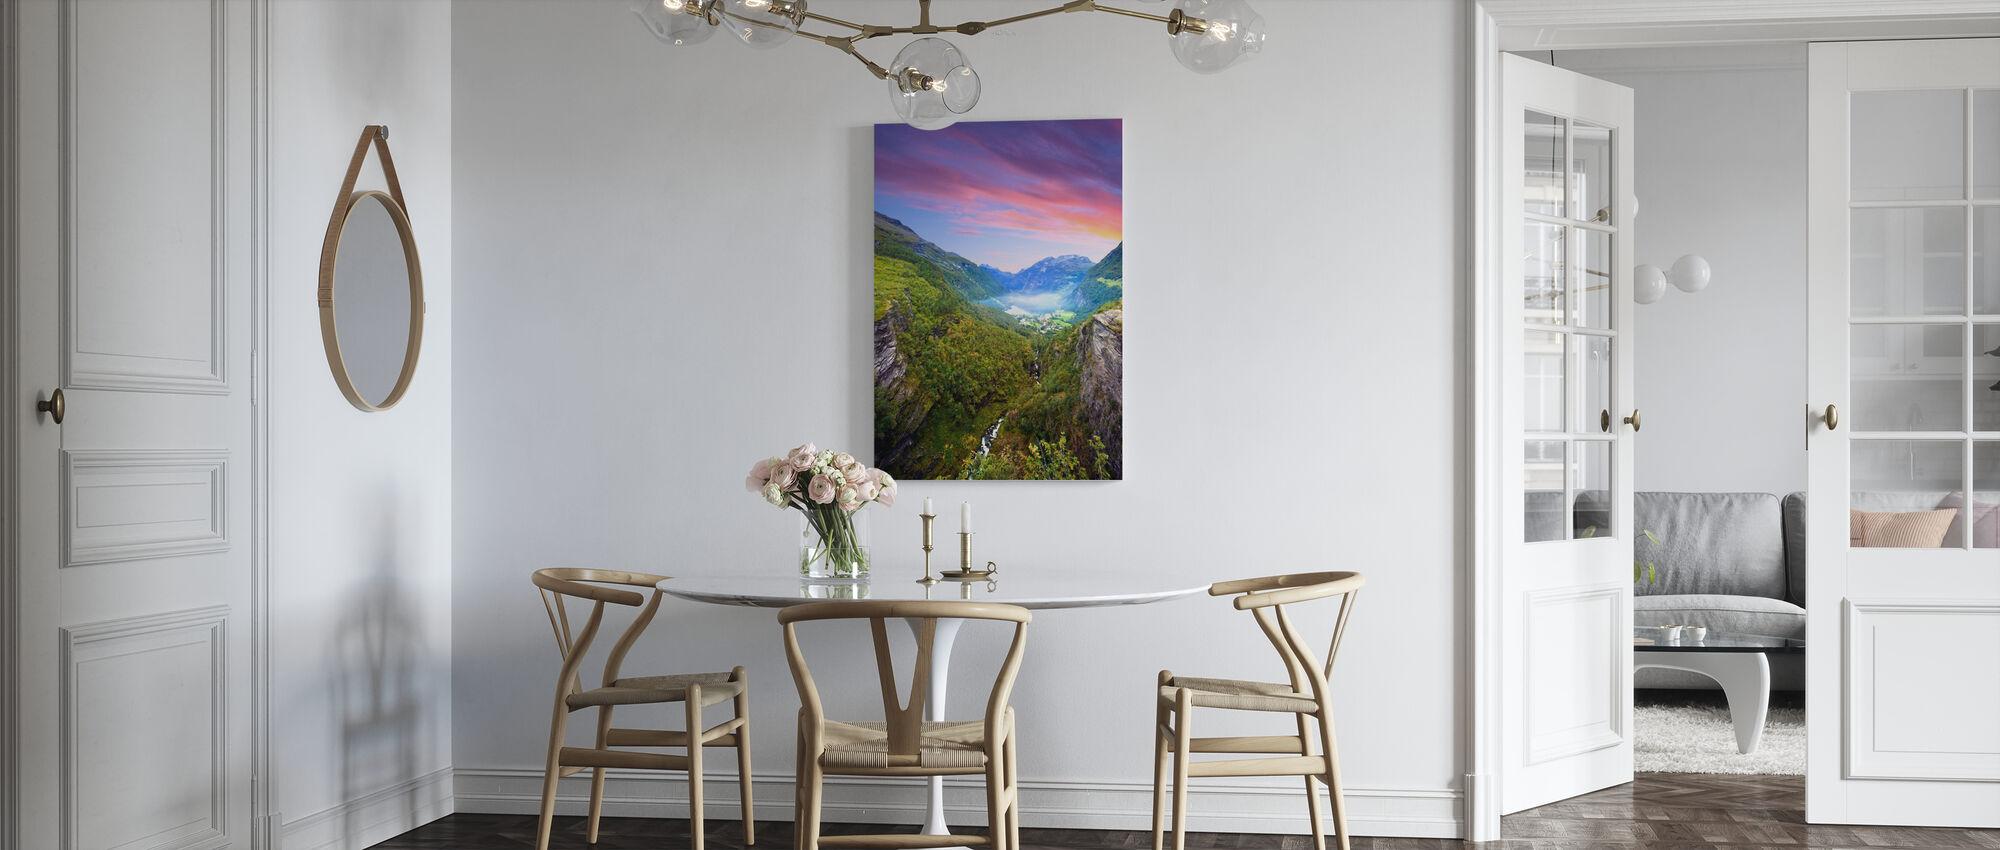 Pink Clouds over Geirangerfjord, Norway - Canvas print - Kitchen